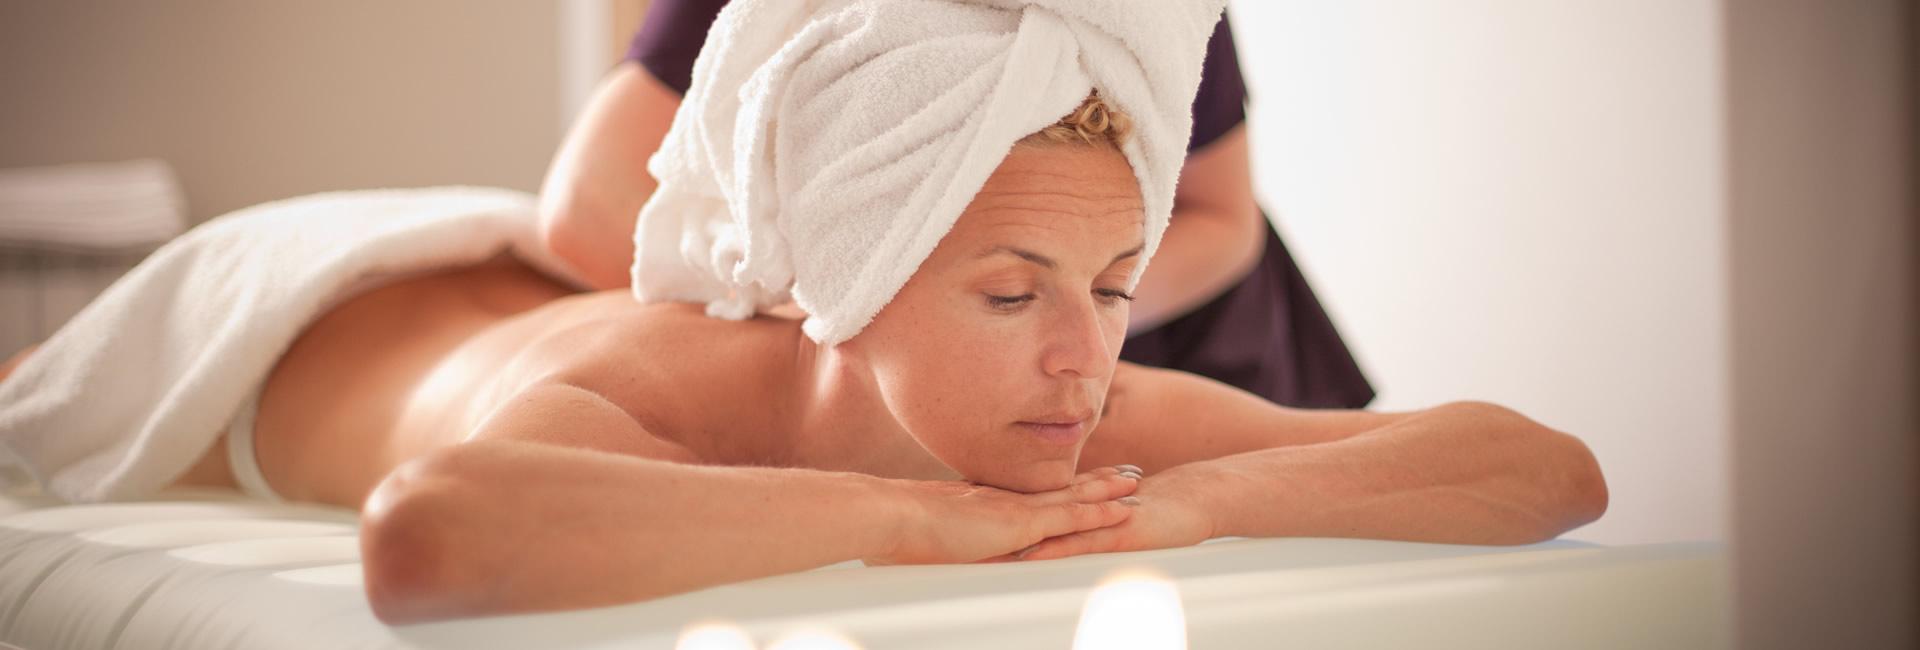 massaggi grosseto livorno siena